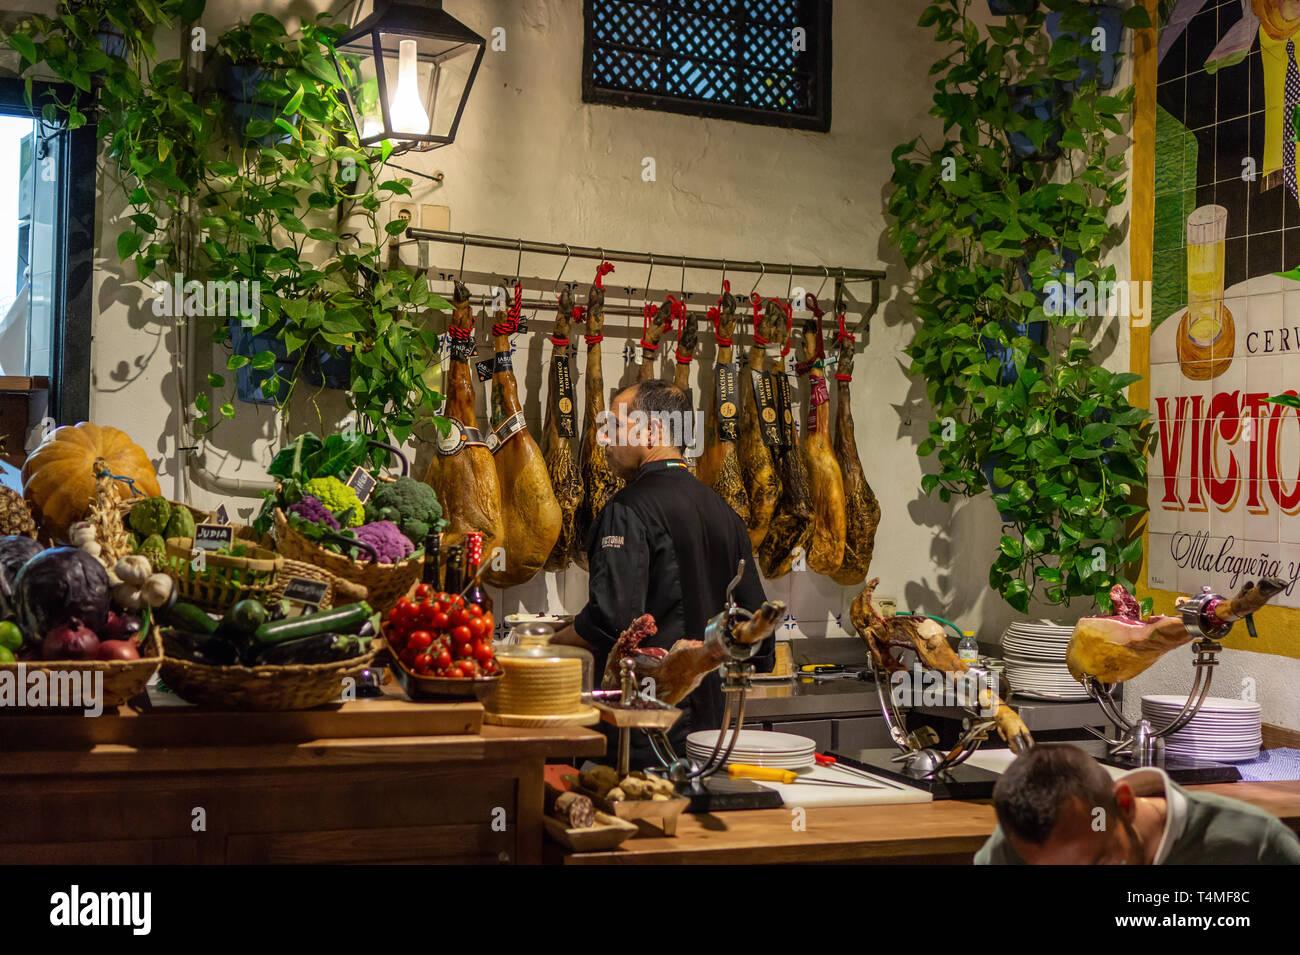 Malaga, Spain 04.04.2019: man waiter butcher in el pimpi restaurant in Malaga who cuts a slices of traditionally spanish jamon de bellota ham - Stock Image